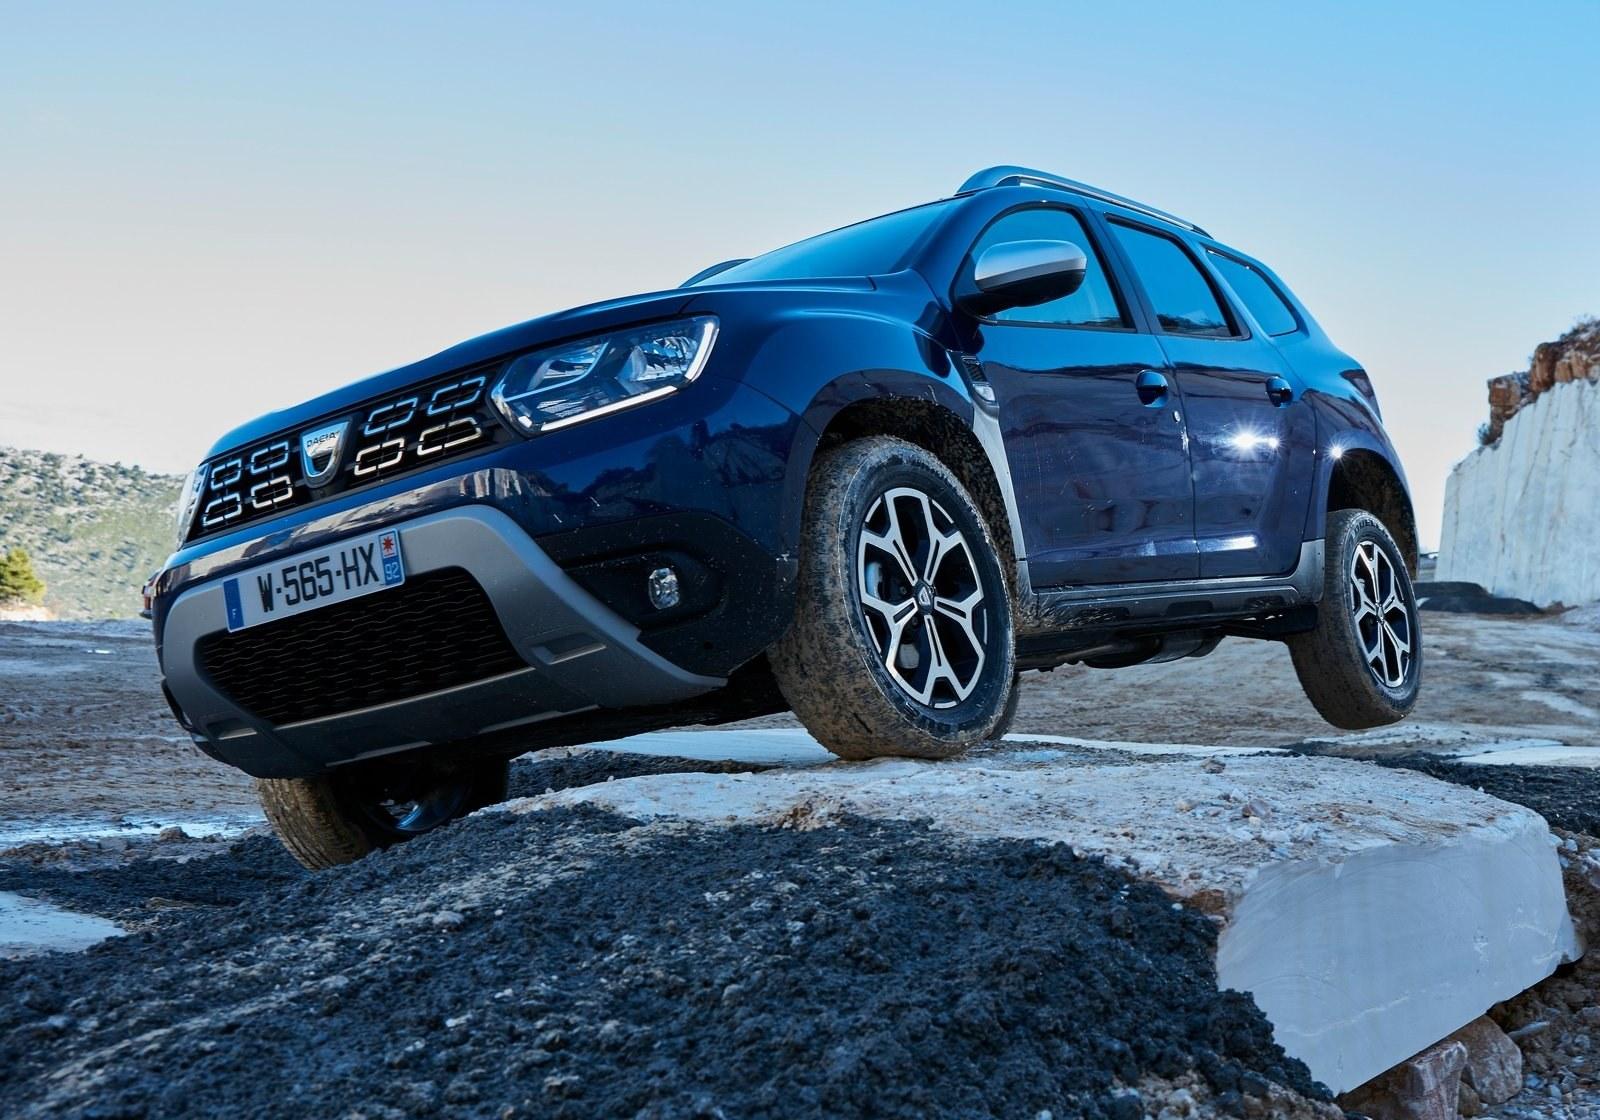 Dacia Duster Glp (1)